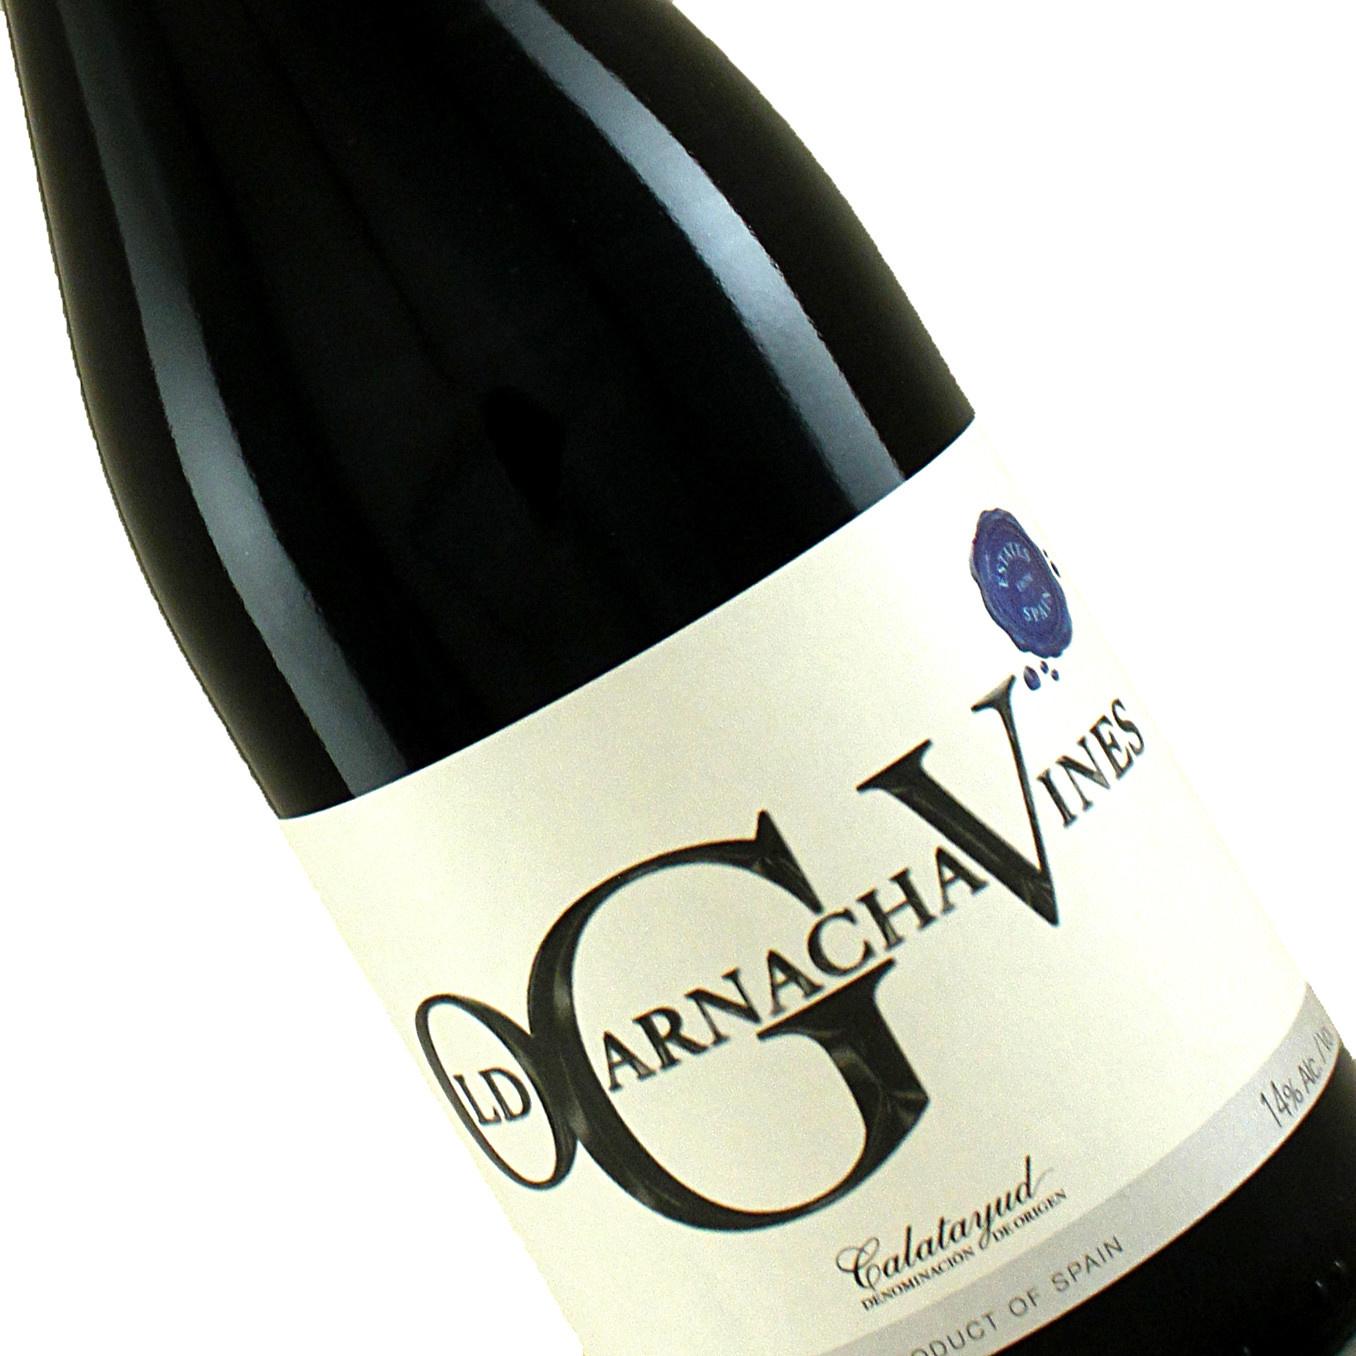 Bodegas Virgin de la Sierra 2016 OGV Old Garnacha Vines, Calatayud Spain